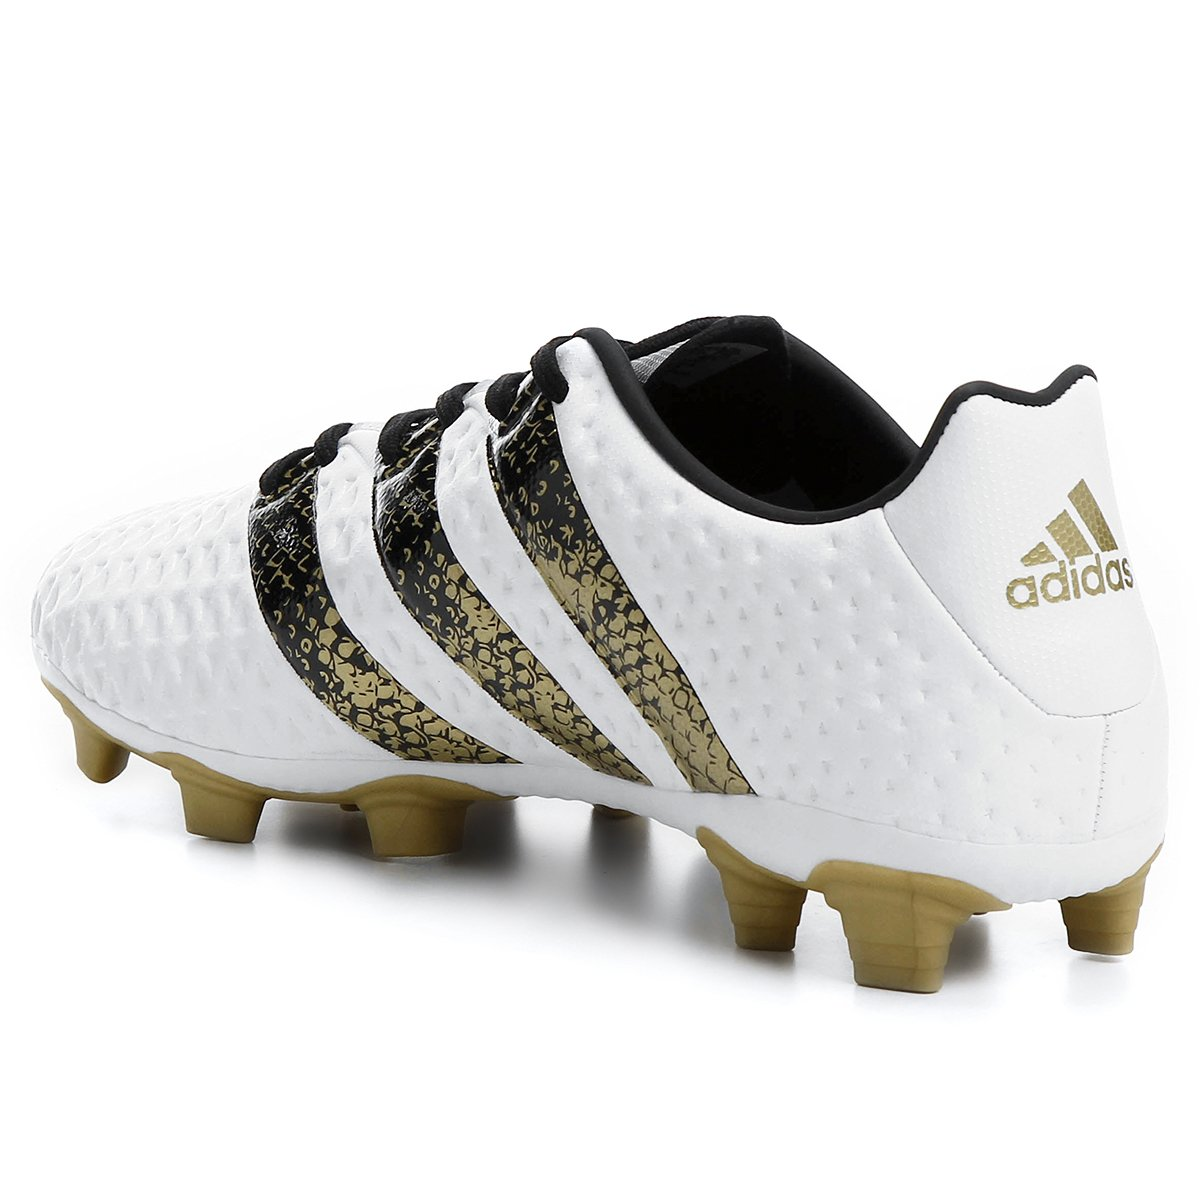 Chuteira Campo Adidas Ace 16.4 FXG Masculina - Branco e Preto ... a968bcb2321f3